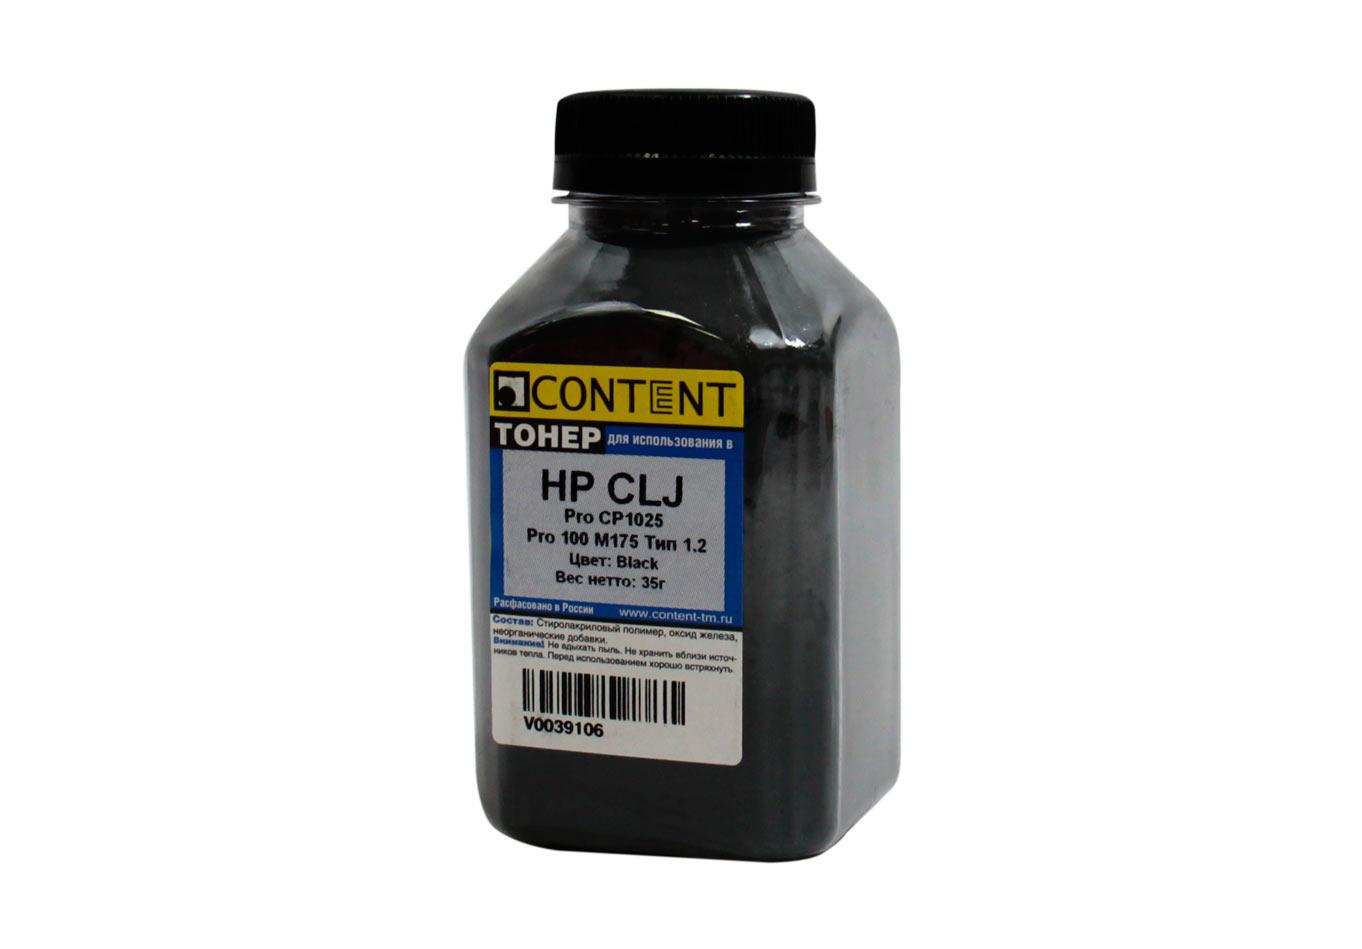 Тонер Content для HP CLJ Pro CP1025/Pro 100 M175, Тип 1.2, Bk, 35 г, банка